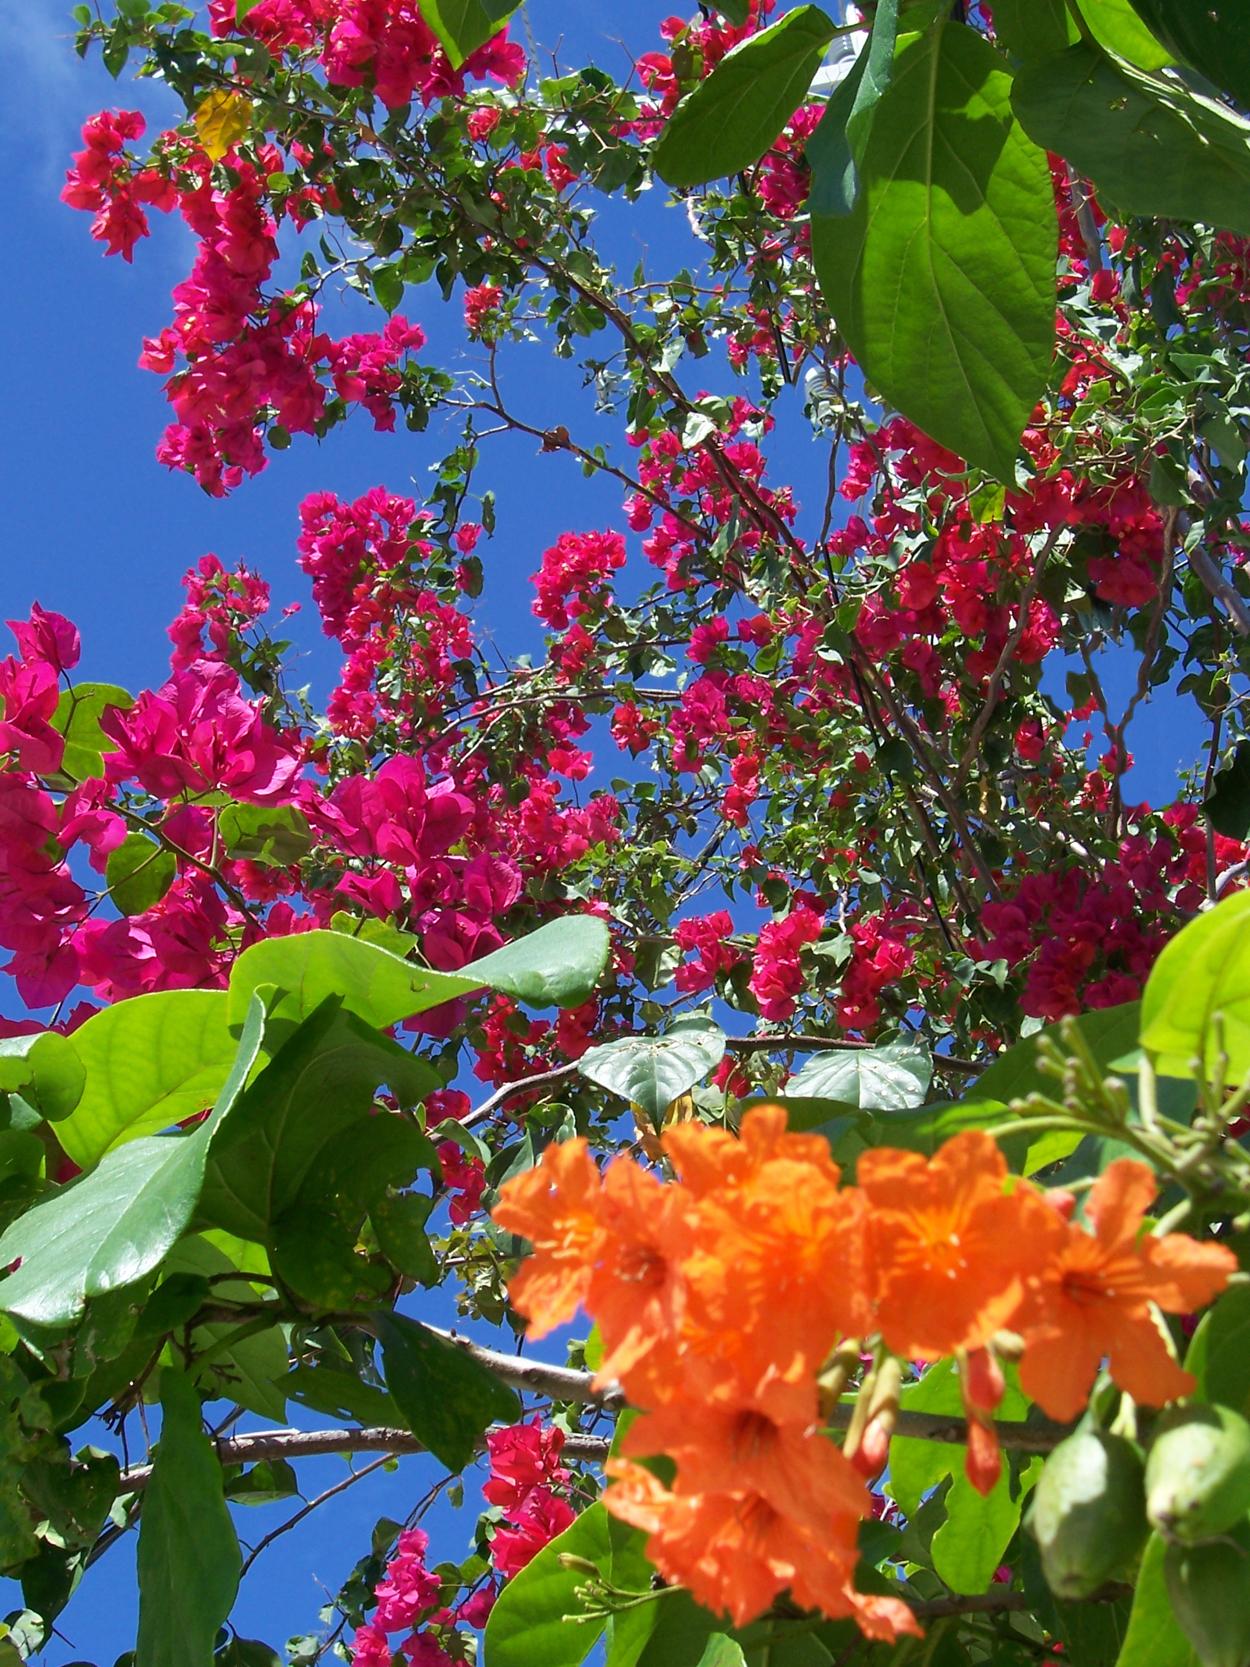 Tropical flowers, Beautiful, Blue, Bspo07, Closeup, HQ Photo